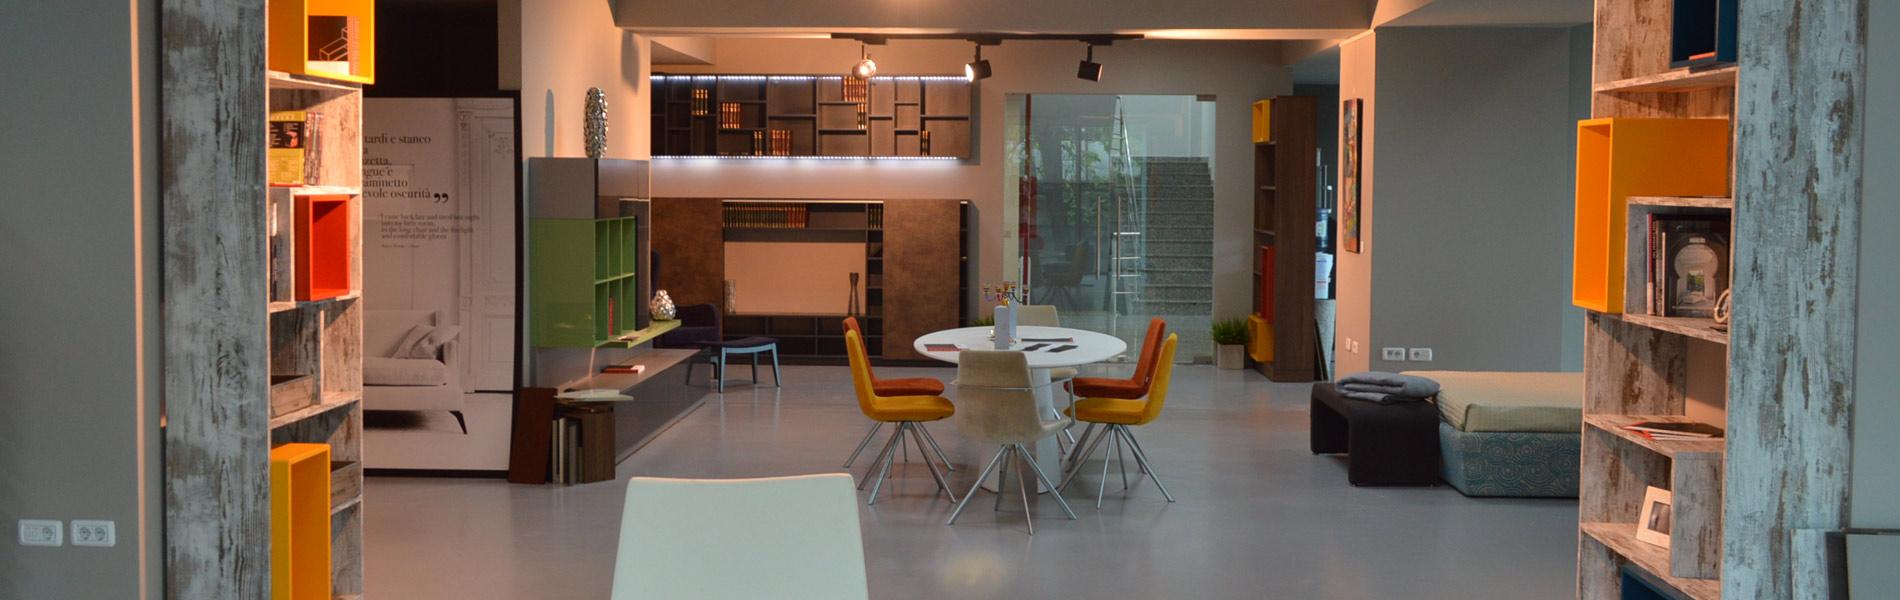 idezio-showroom